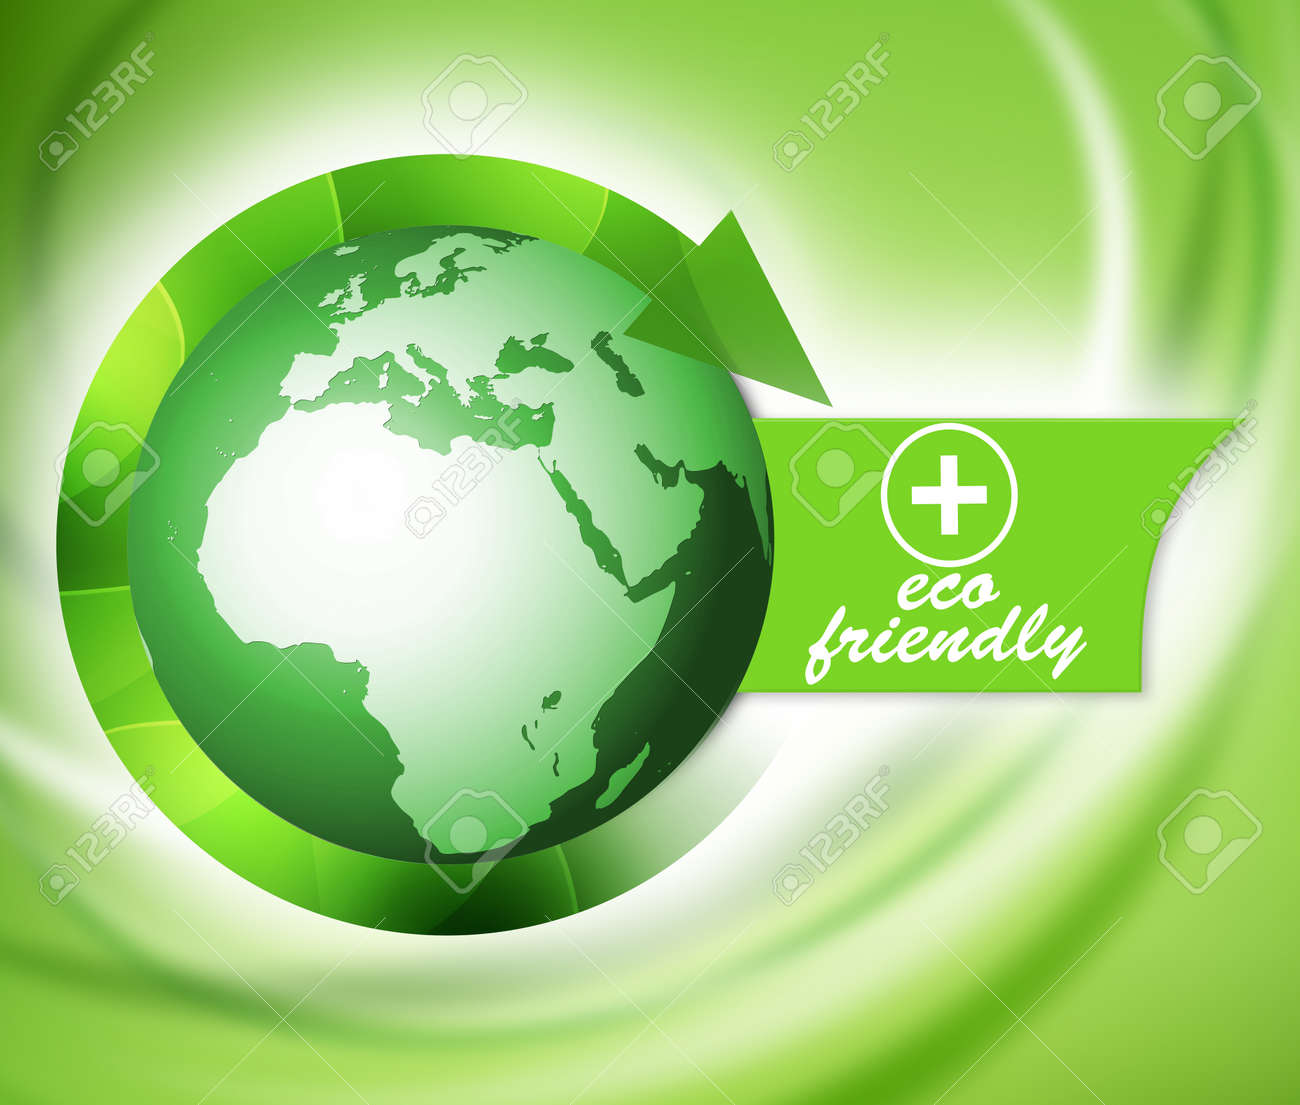 Green bio eco friendly world, life nature Stock Photo - 16557382